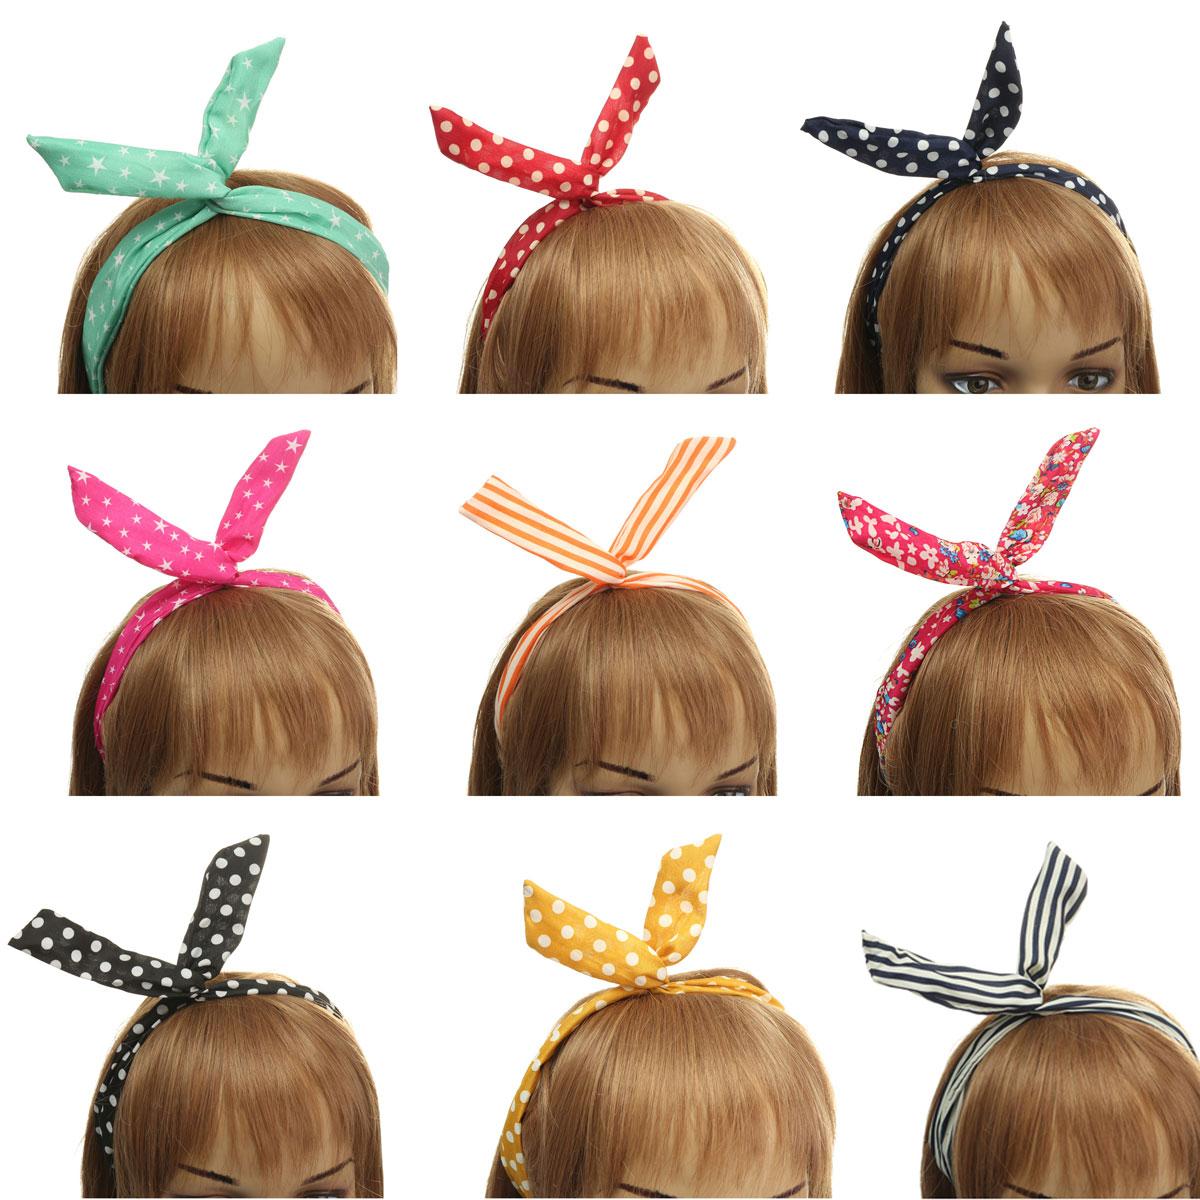 Lovely Retro Polka Dot Headband Tie Bunny Ears Girls Wired Hairband Hair Accessories